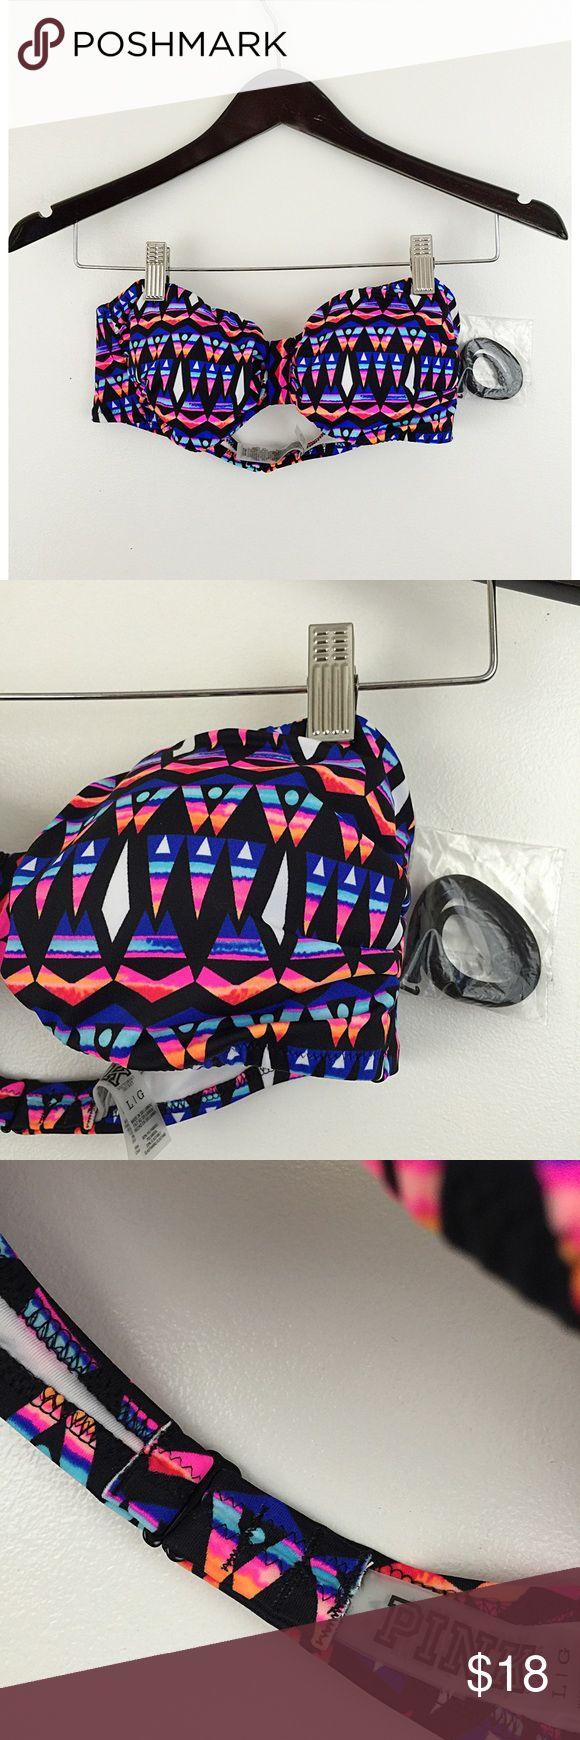 NWT VICTORIA'S SECRET PINK Aztec Bandeau Bikini L NWT VICTORIA'S SECRET PINK Aztec Bandeau Bikini Top. Sz Large. Victoria's Secret Swim Bikinis